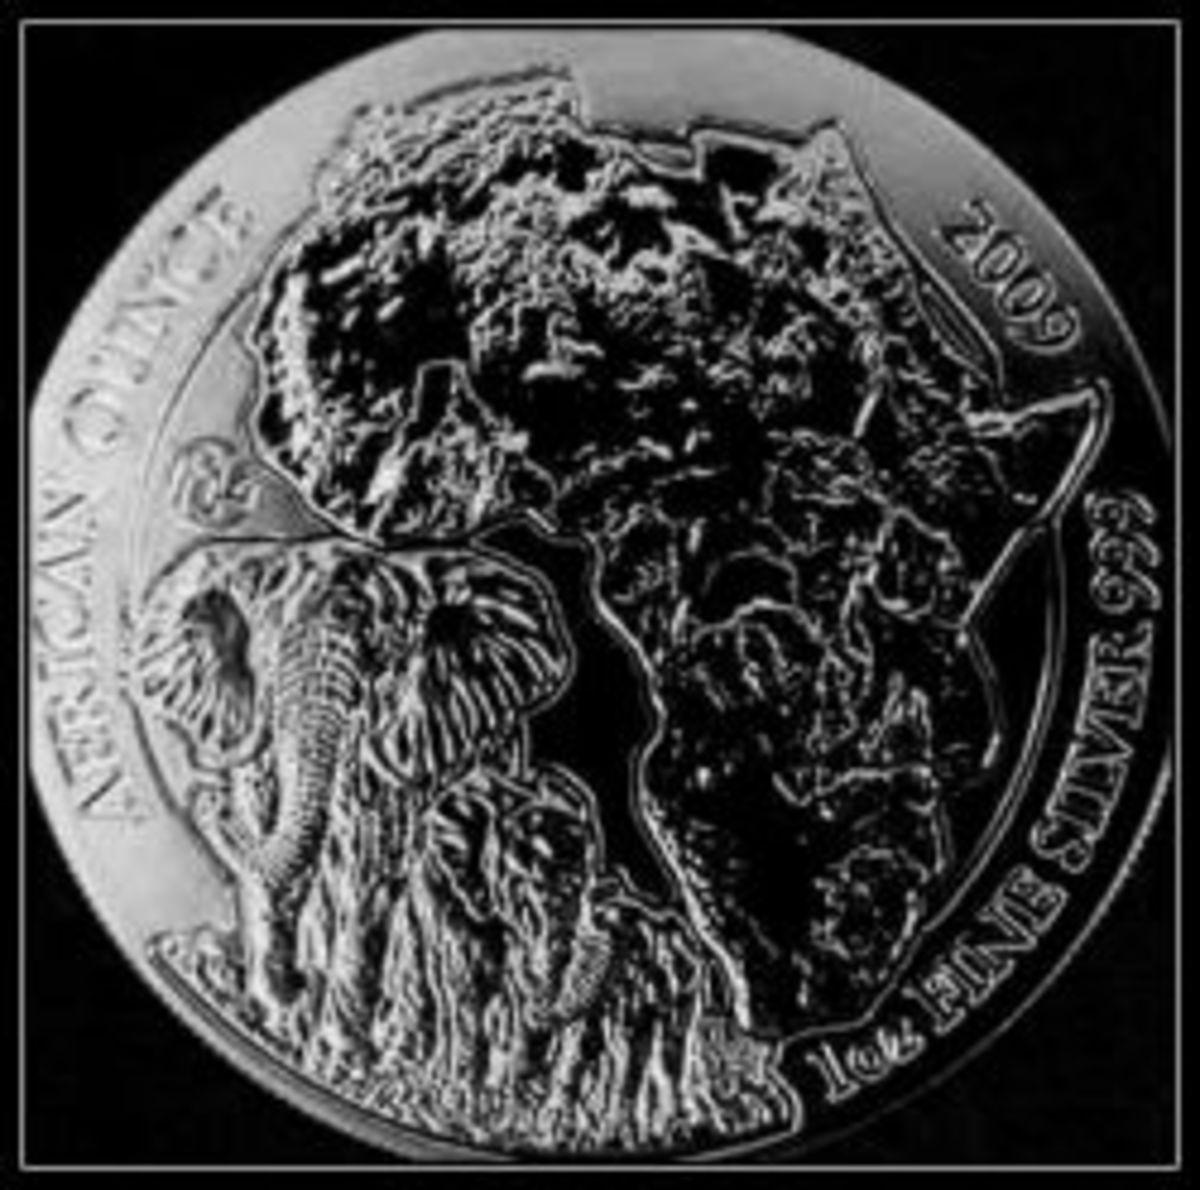 2009 Rwanda Elephant Silver Coin